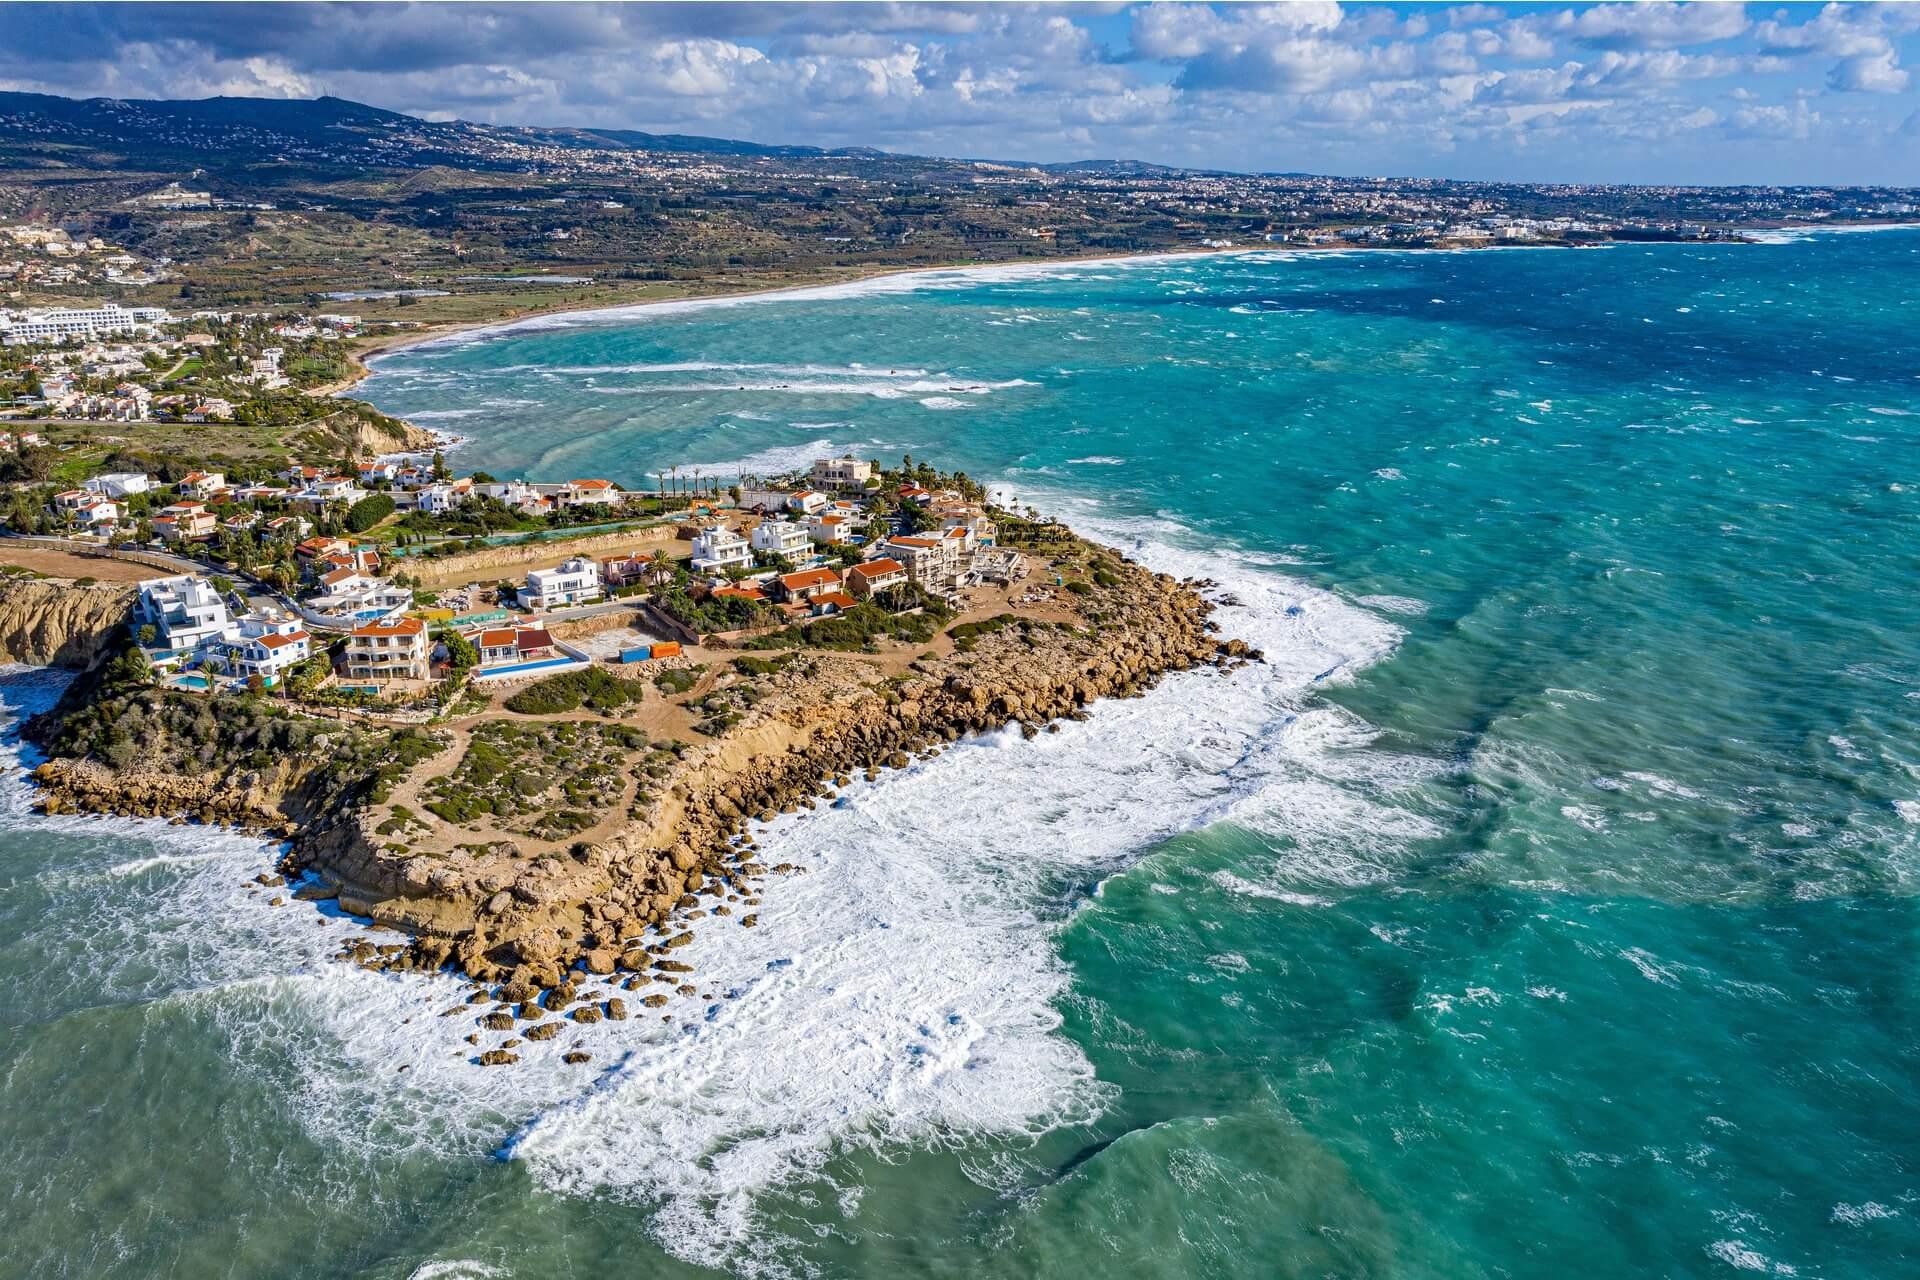 Peyia | Akamas Peninsula | Daniel Jedzura | Shutterstock